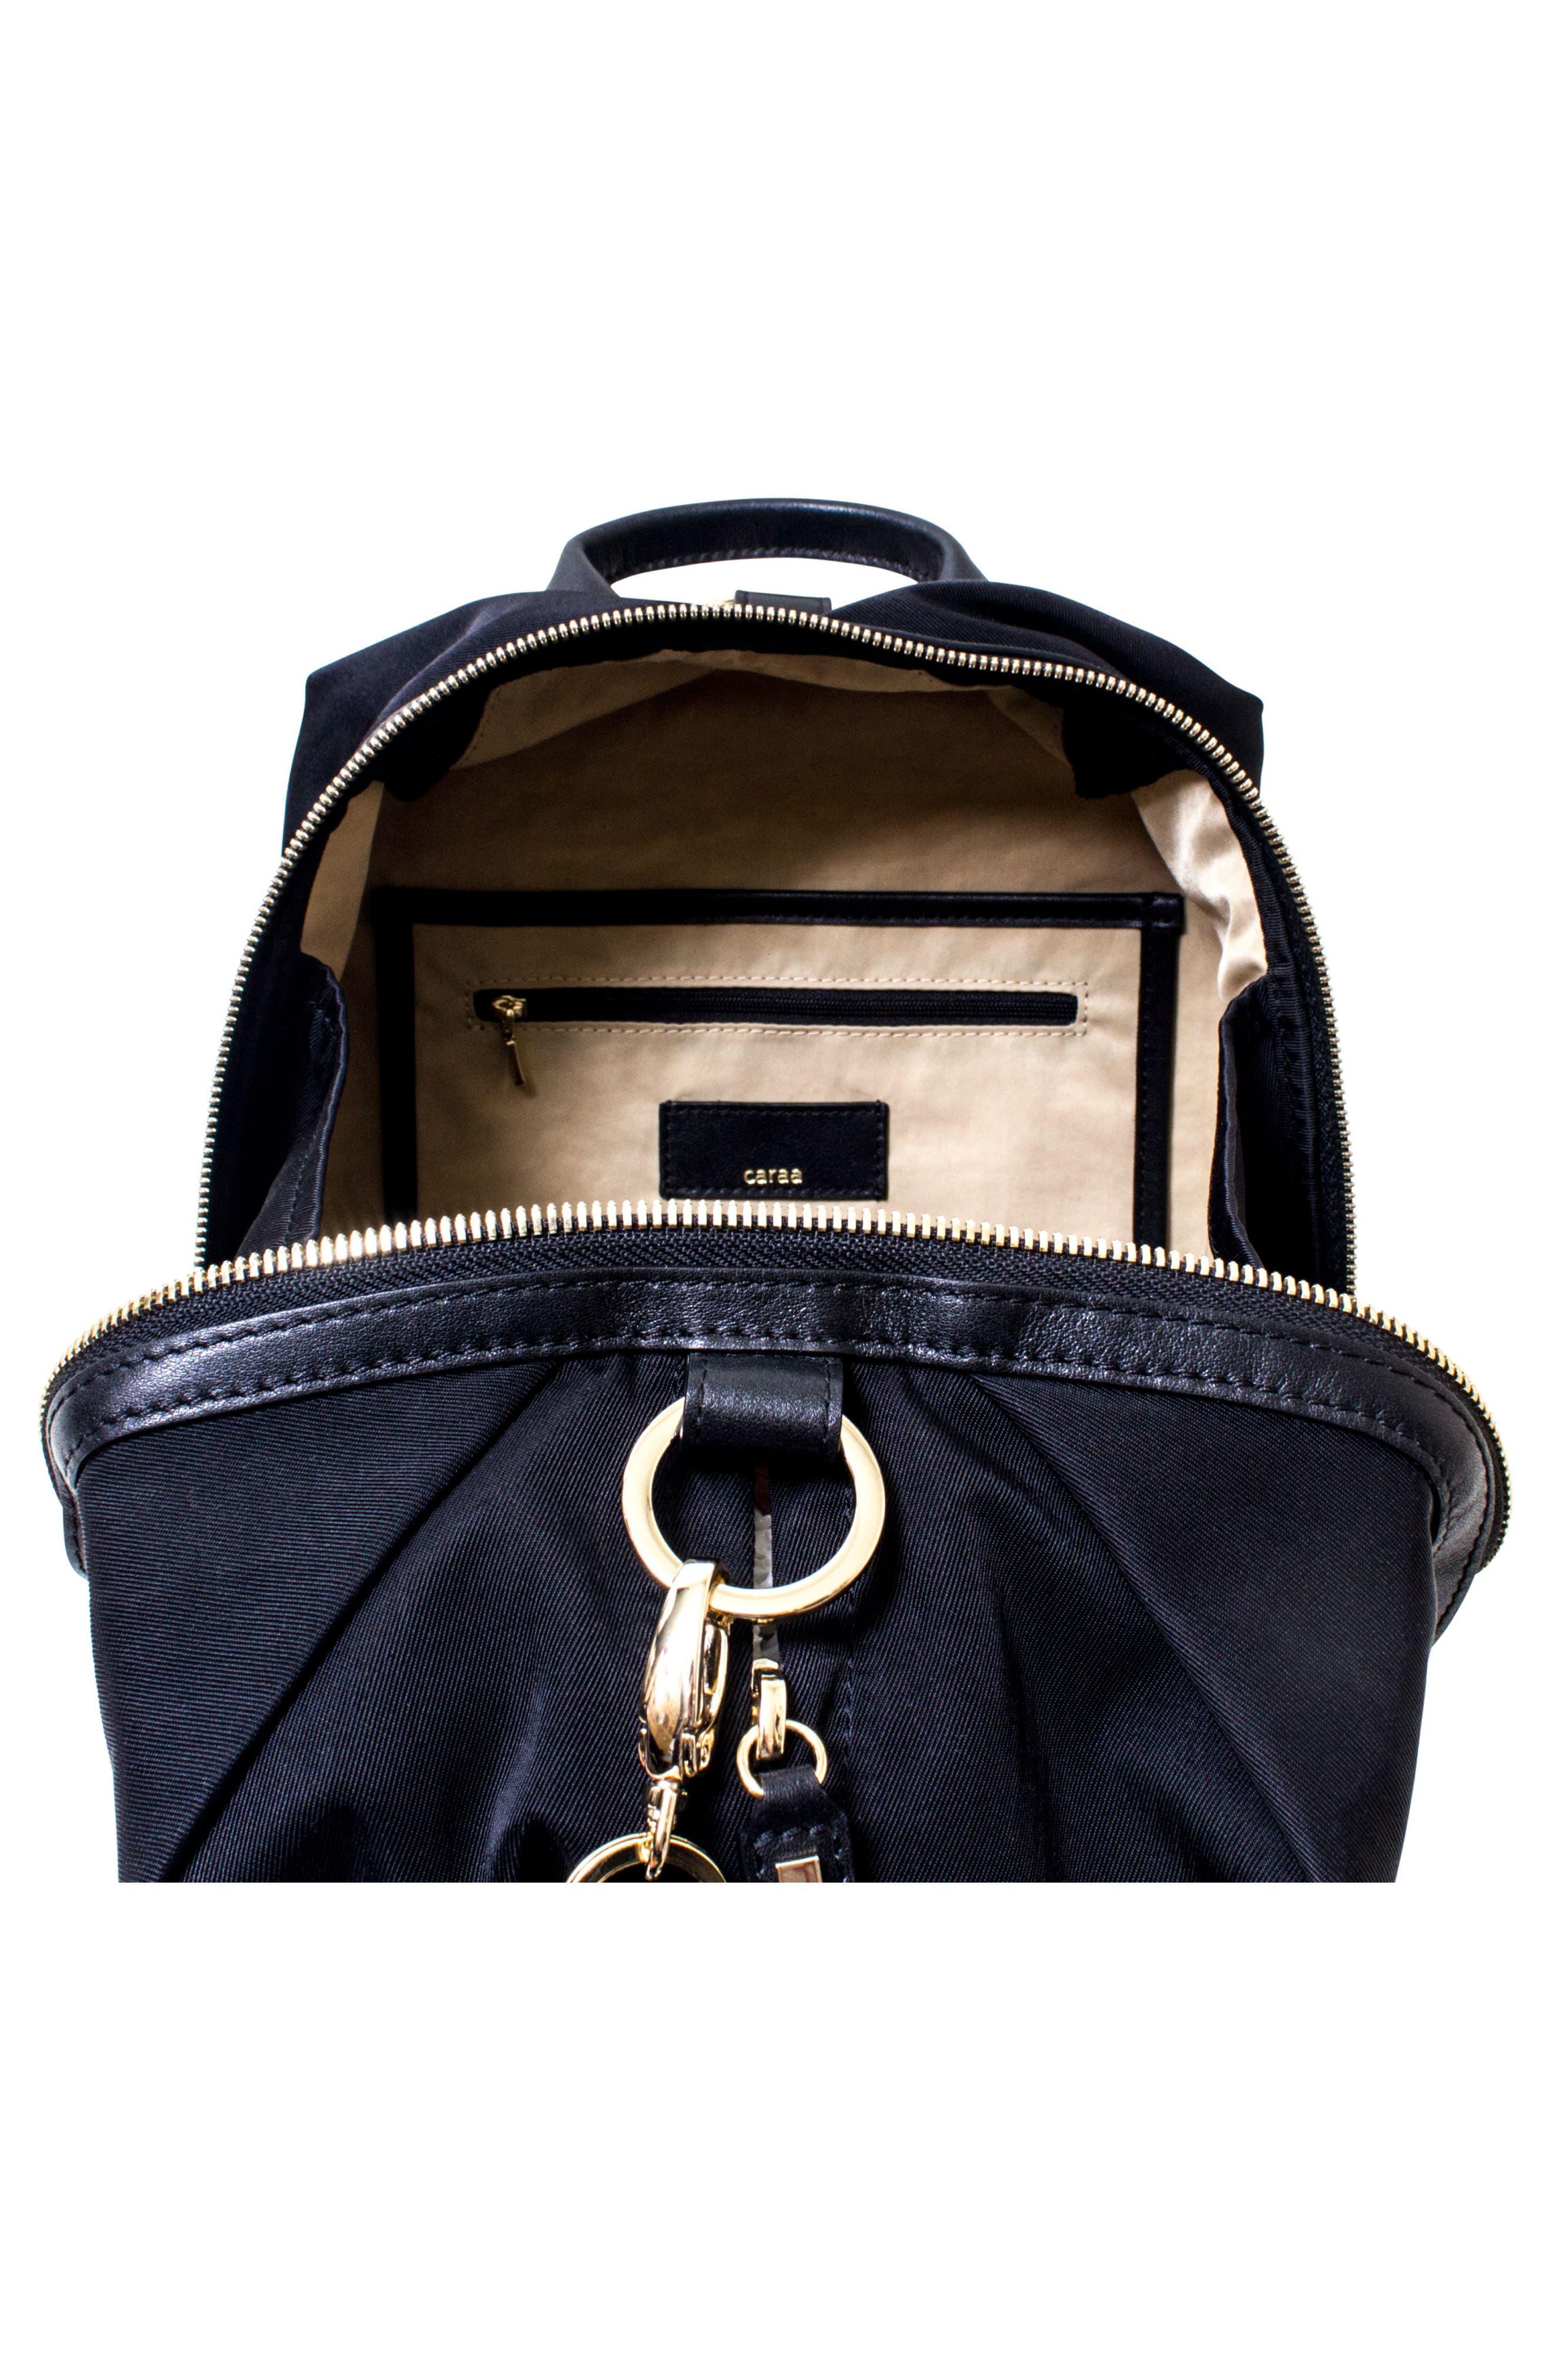 Studio Duffel Backpack,                             Alternate thumbnail 4, color,                             BLACK/ GOLD